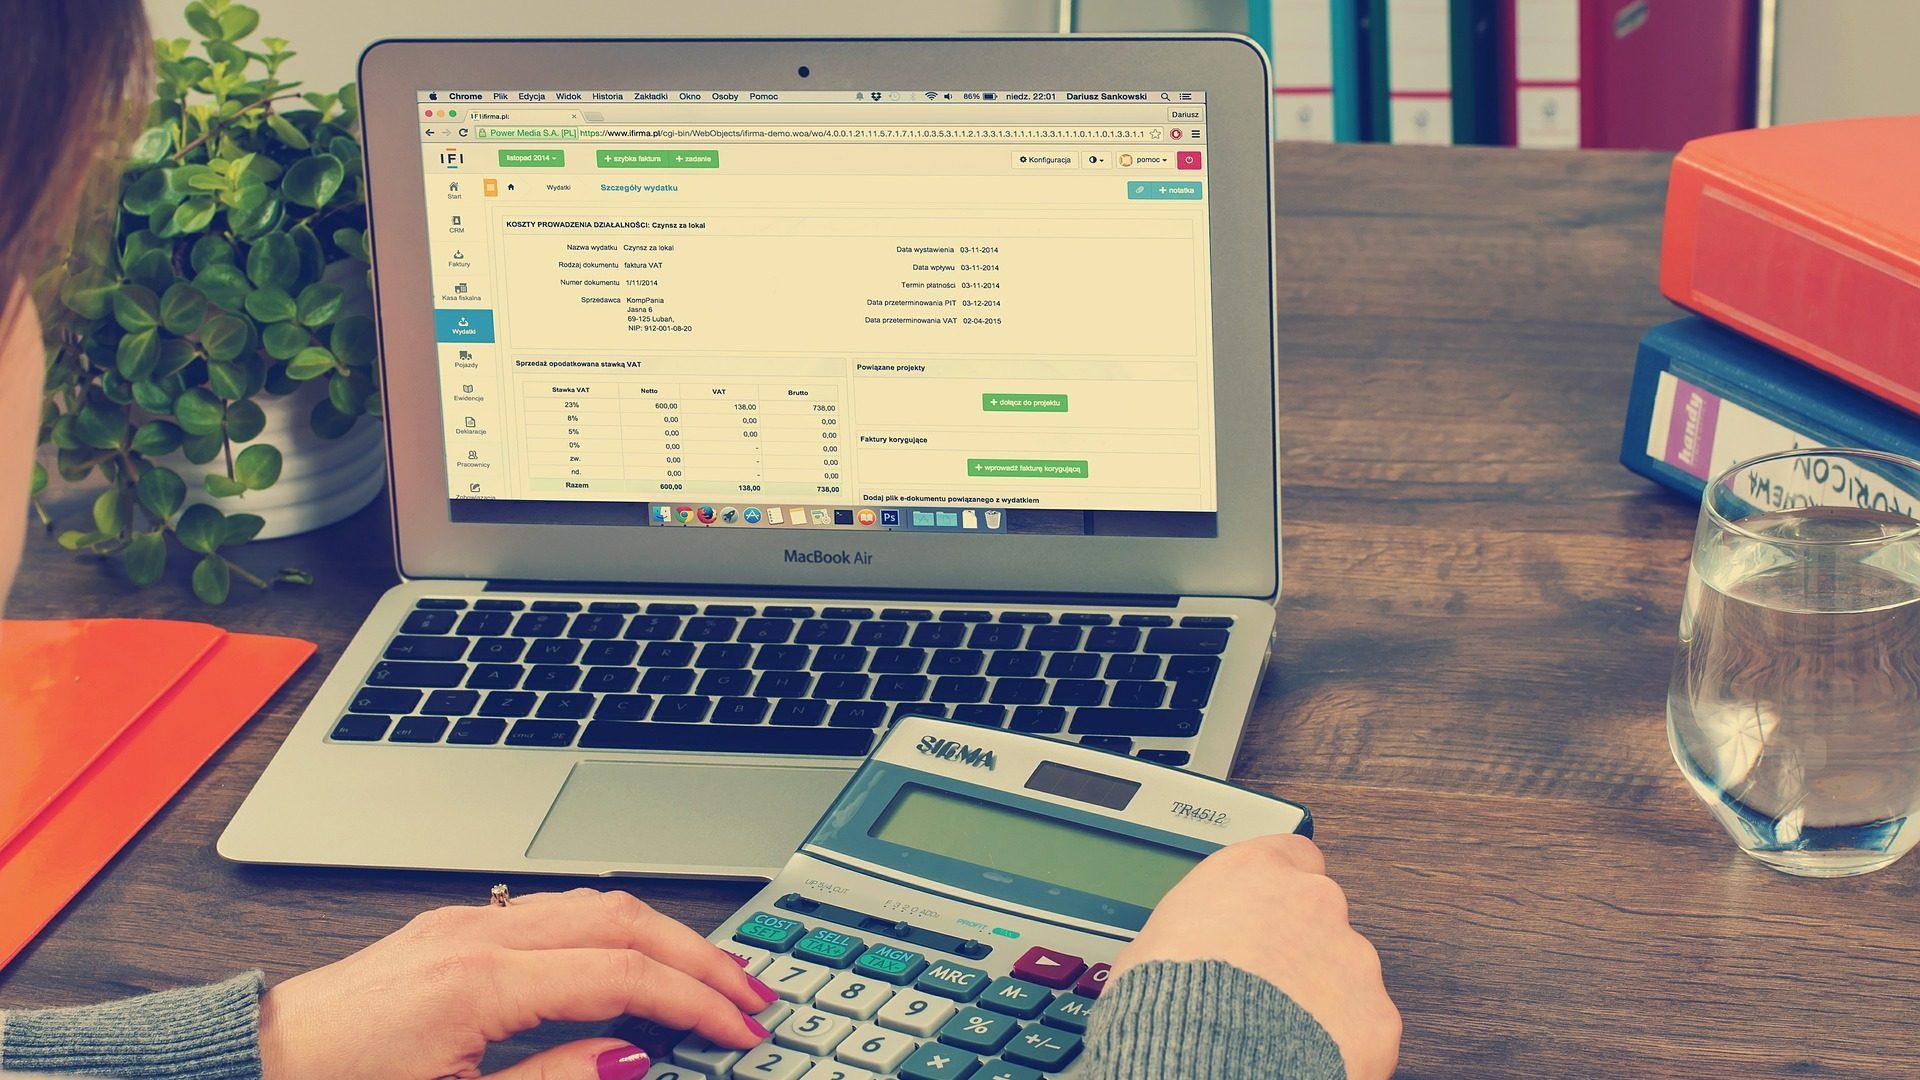 Kennispunt VAT solutions